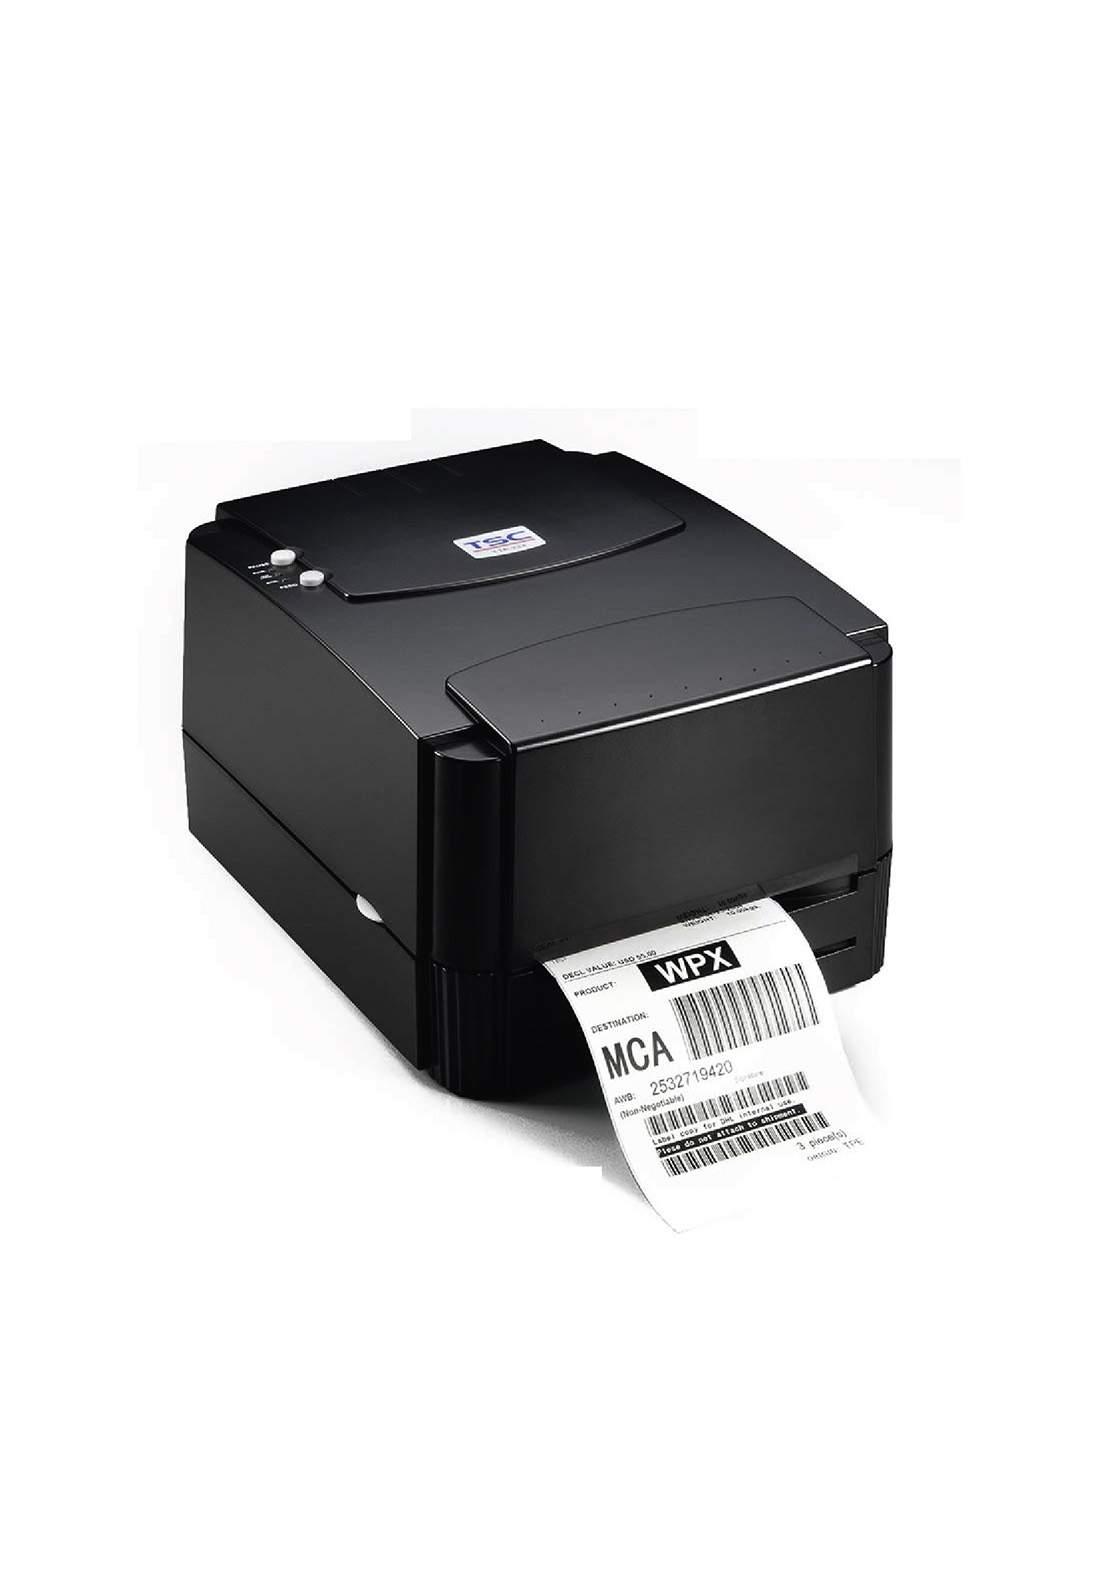 TSC TTP-244 Pro Barcode Label Printer - Black طابعة باركود